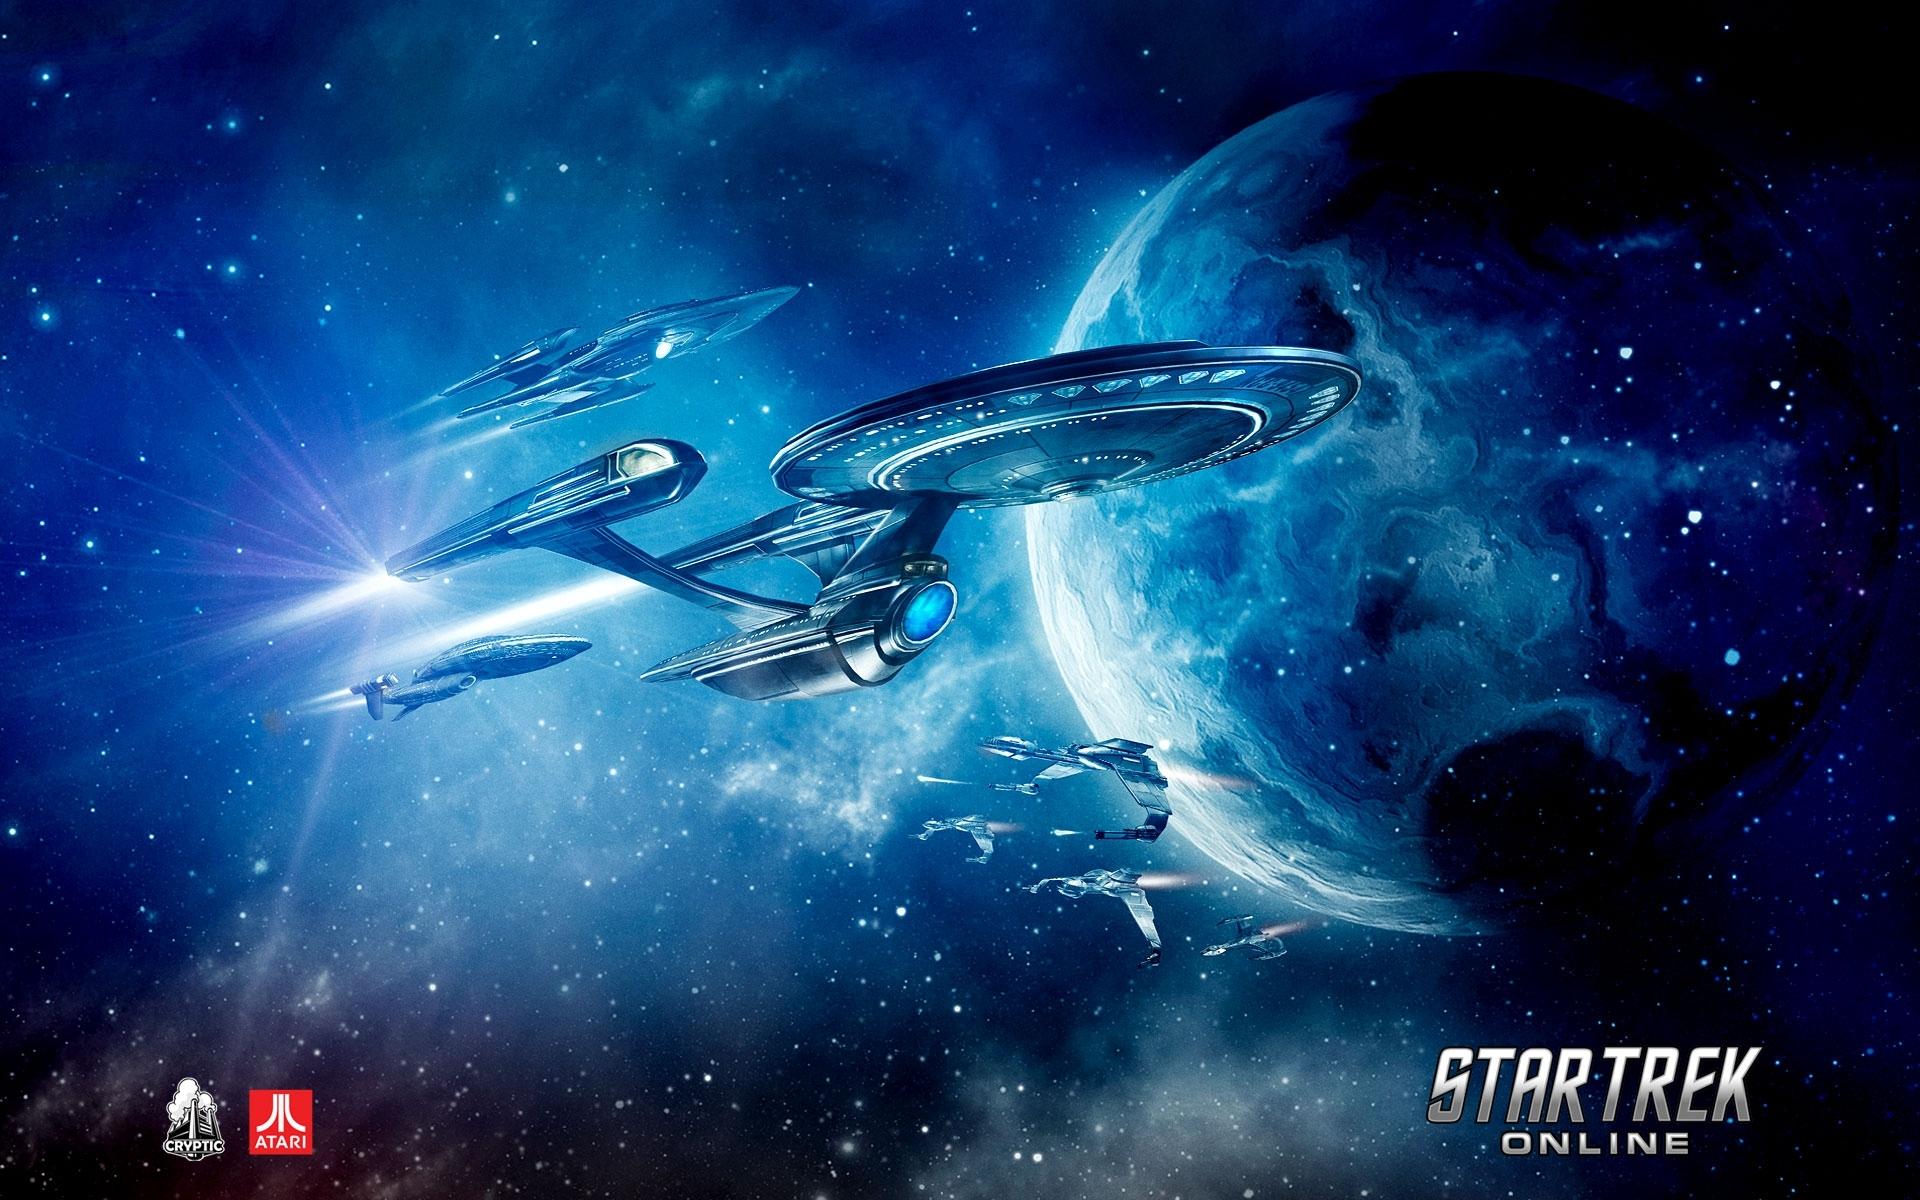 star trek online | free desktop wallpapers for widescreen, hd and mobile